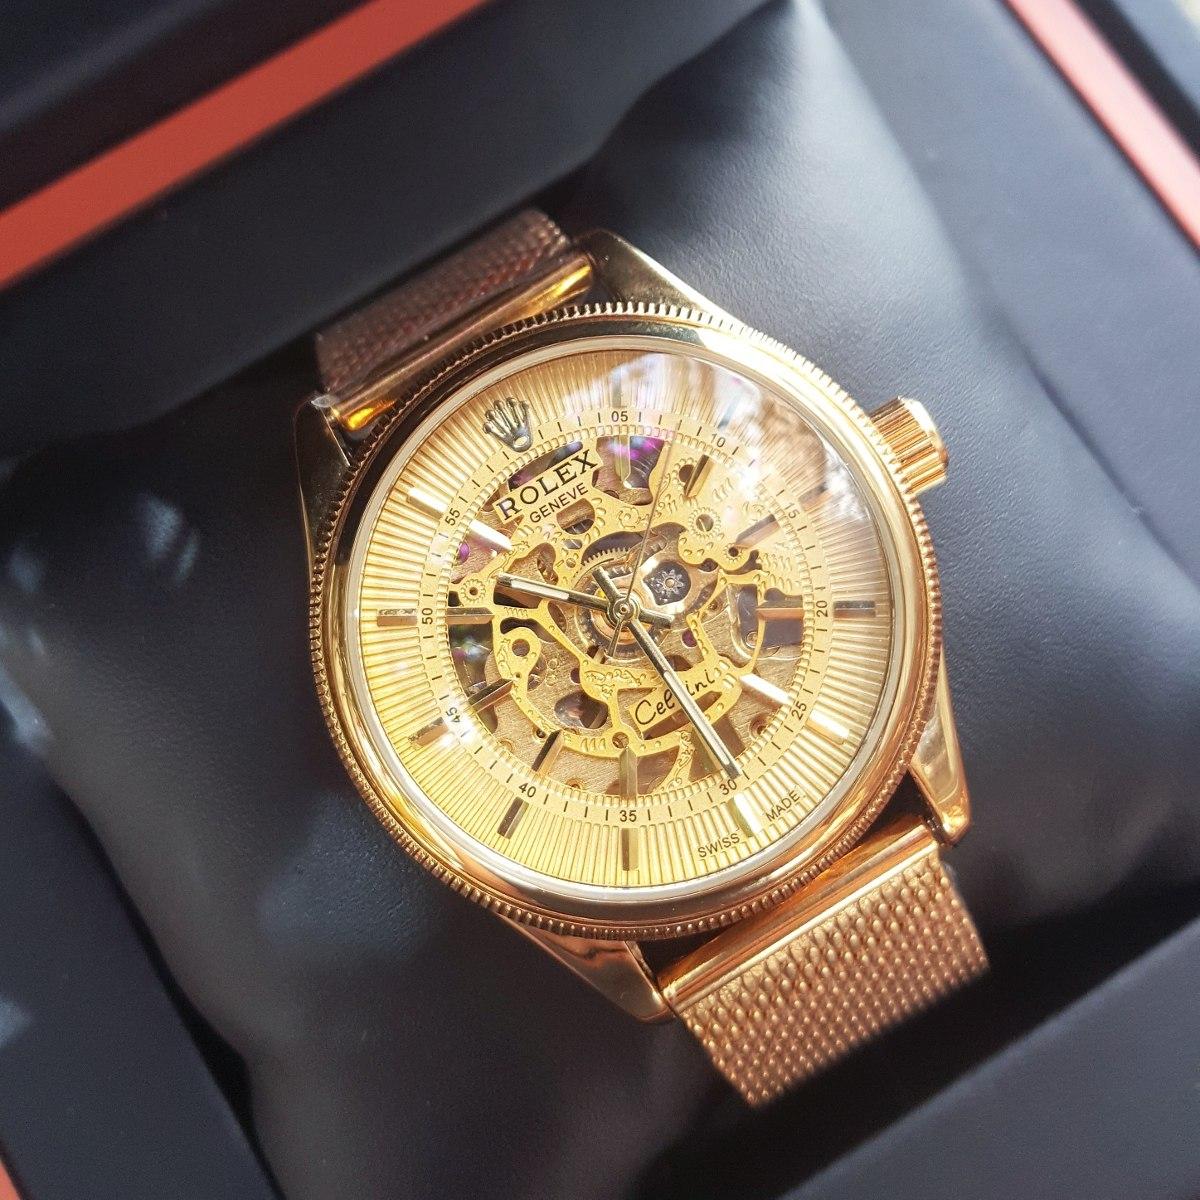 ce2914e040d Reloj Rolex Automatico Corazon Abierto R.n8 -   155.000 en Mercado Libre